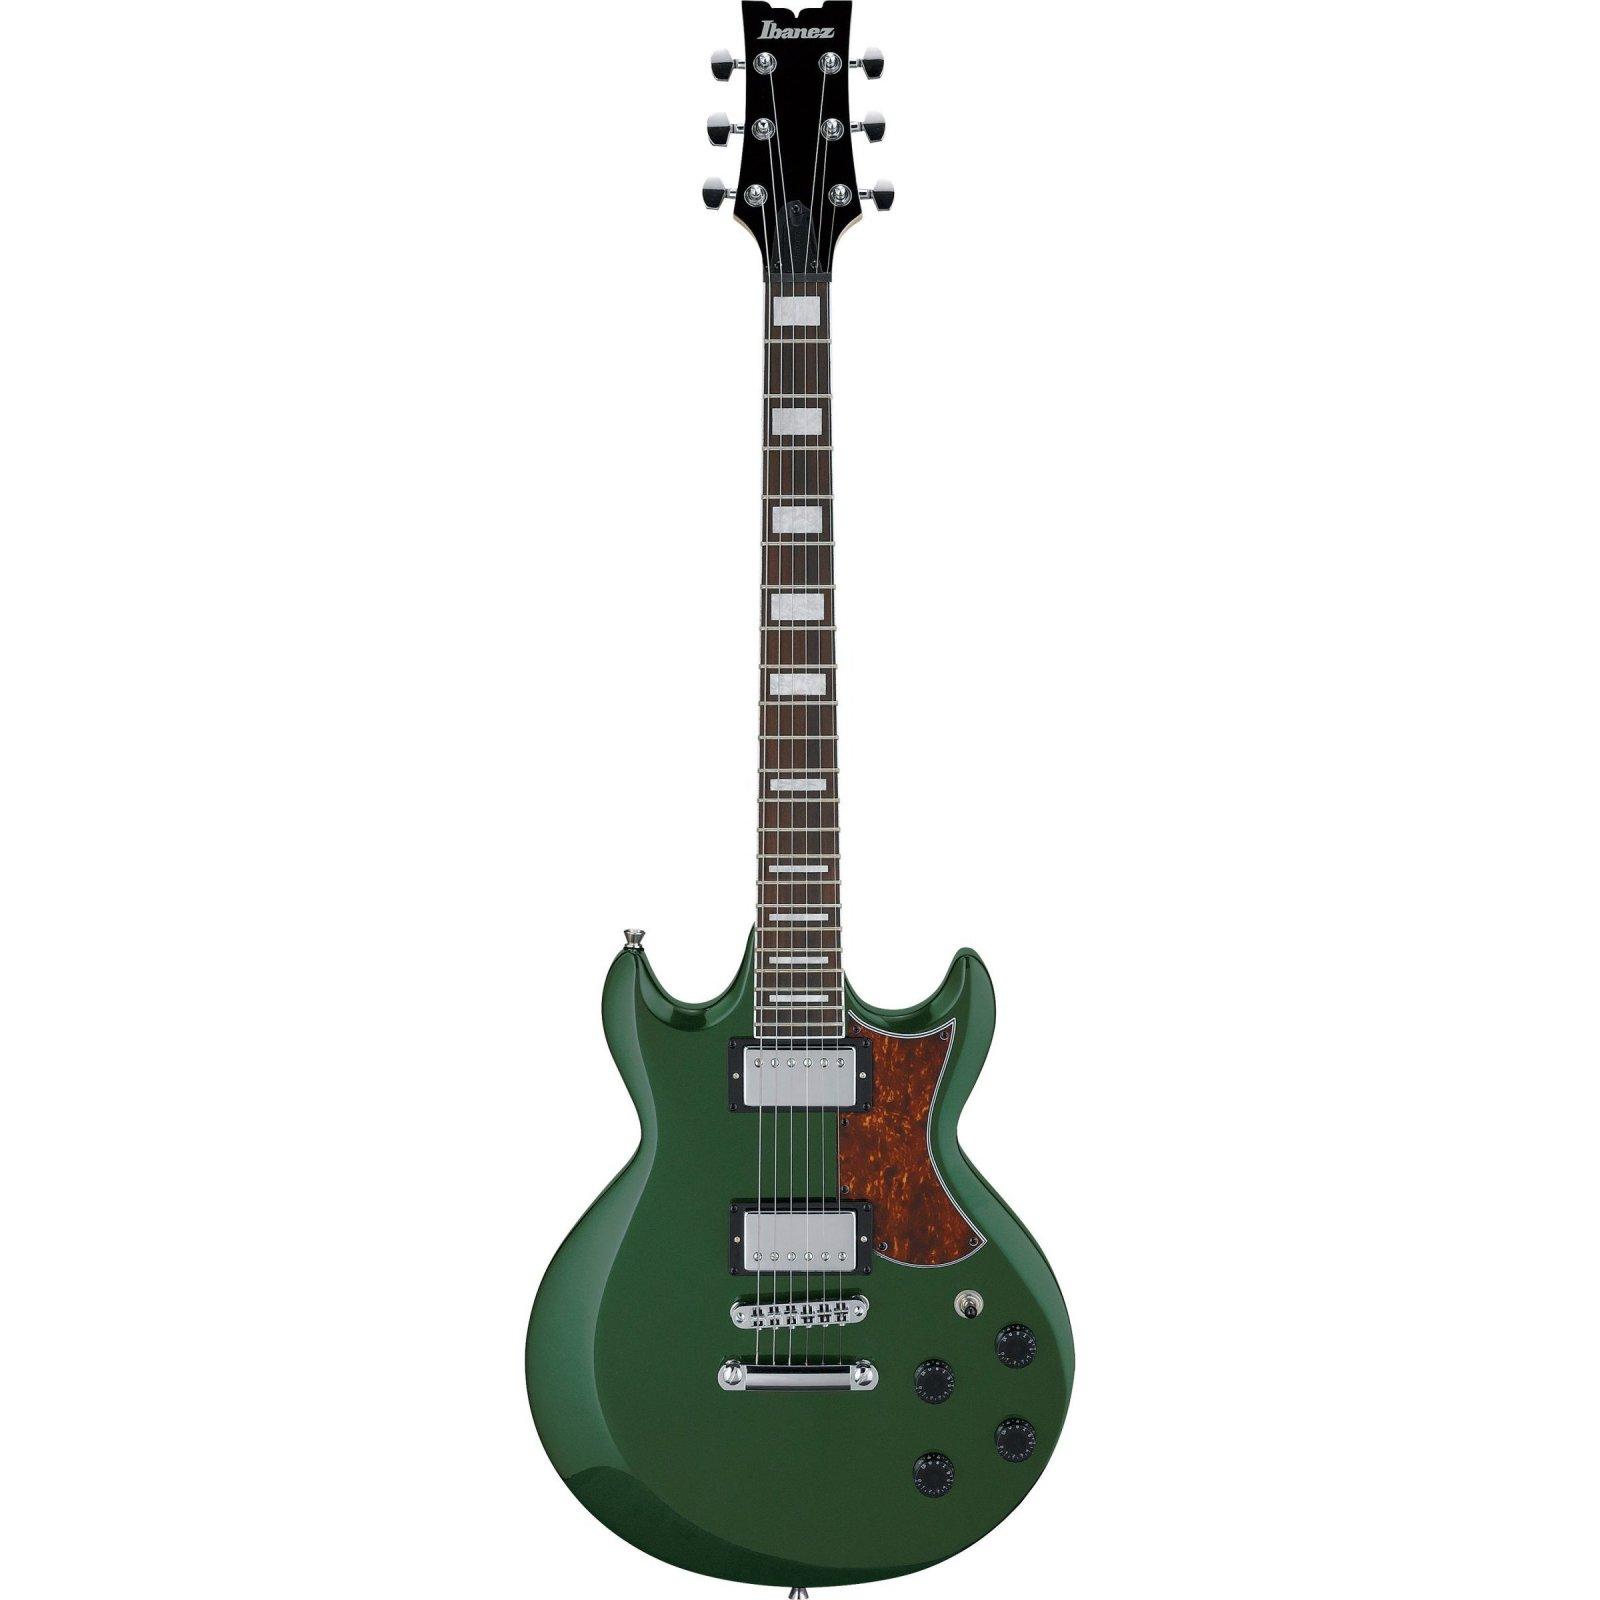 Ibanez AX120MFT Electric Guitar